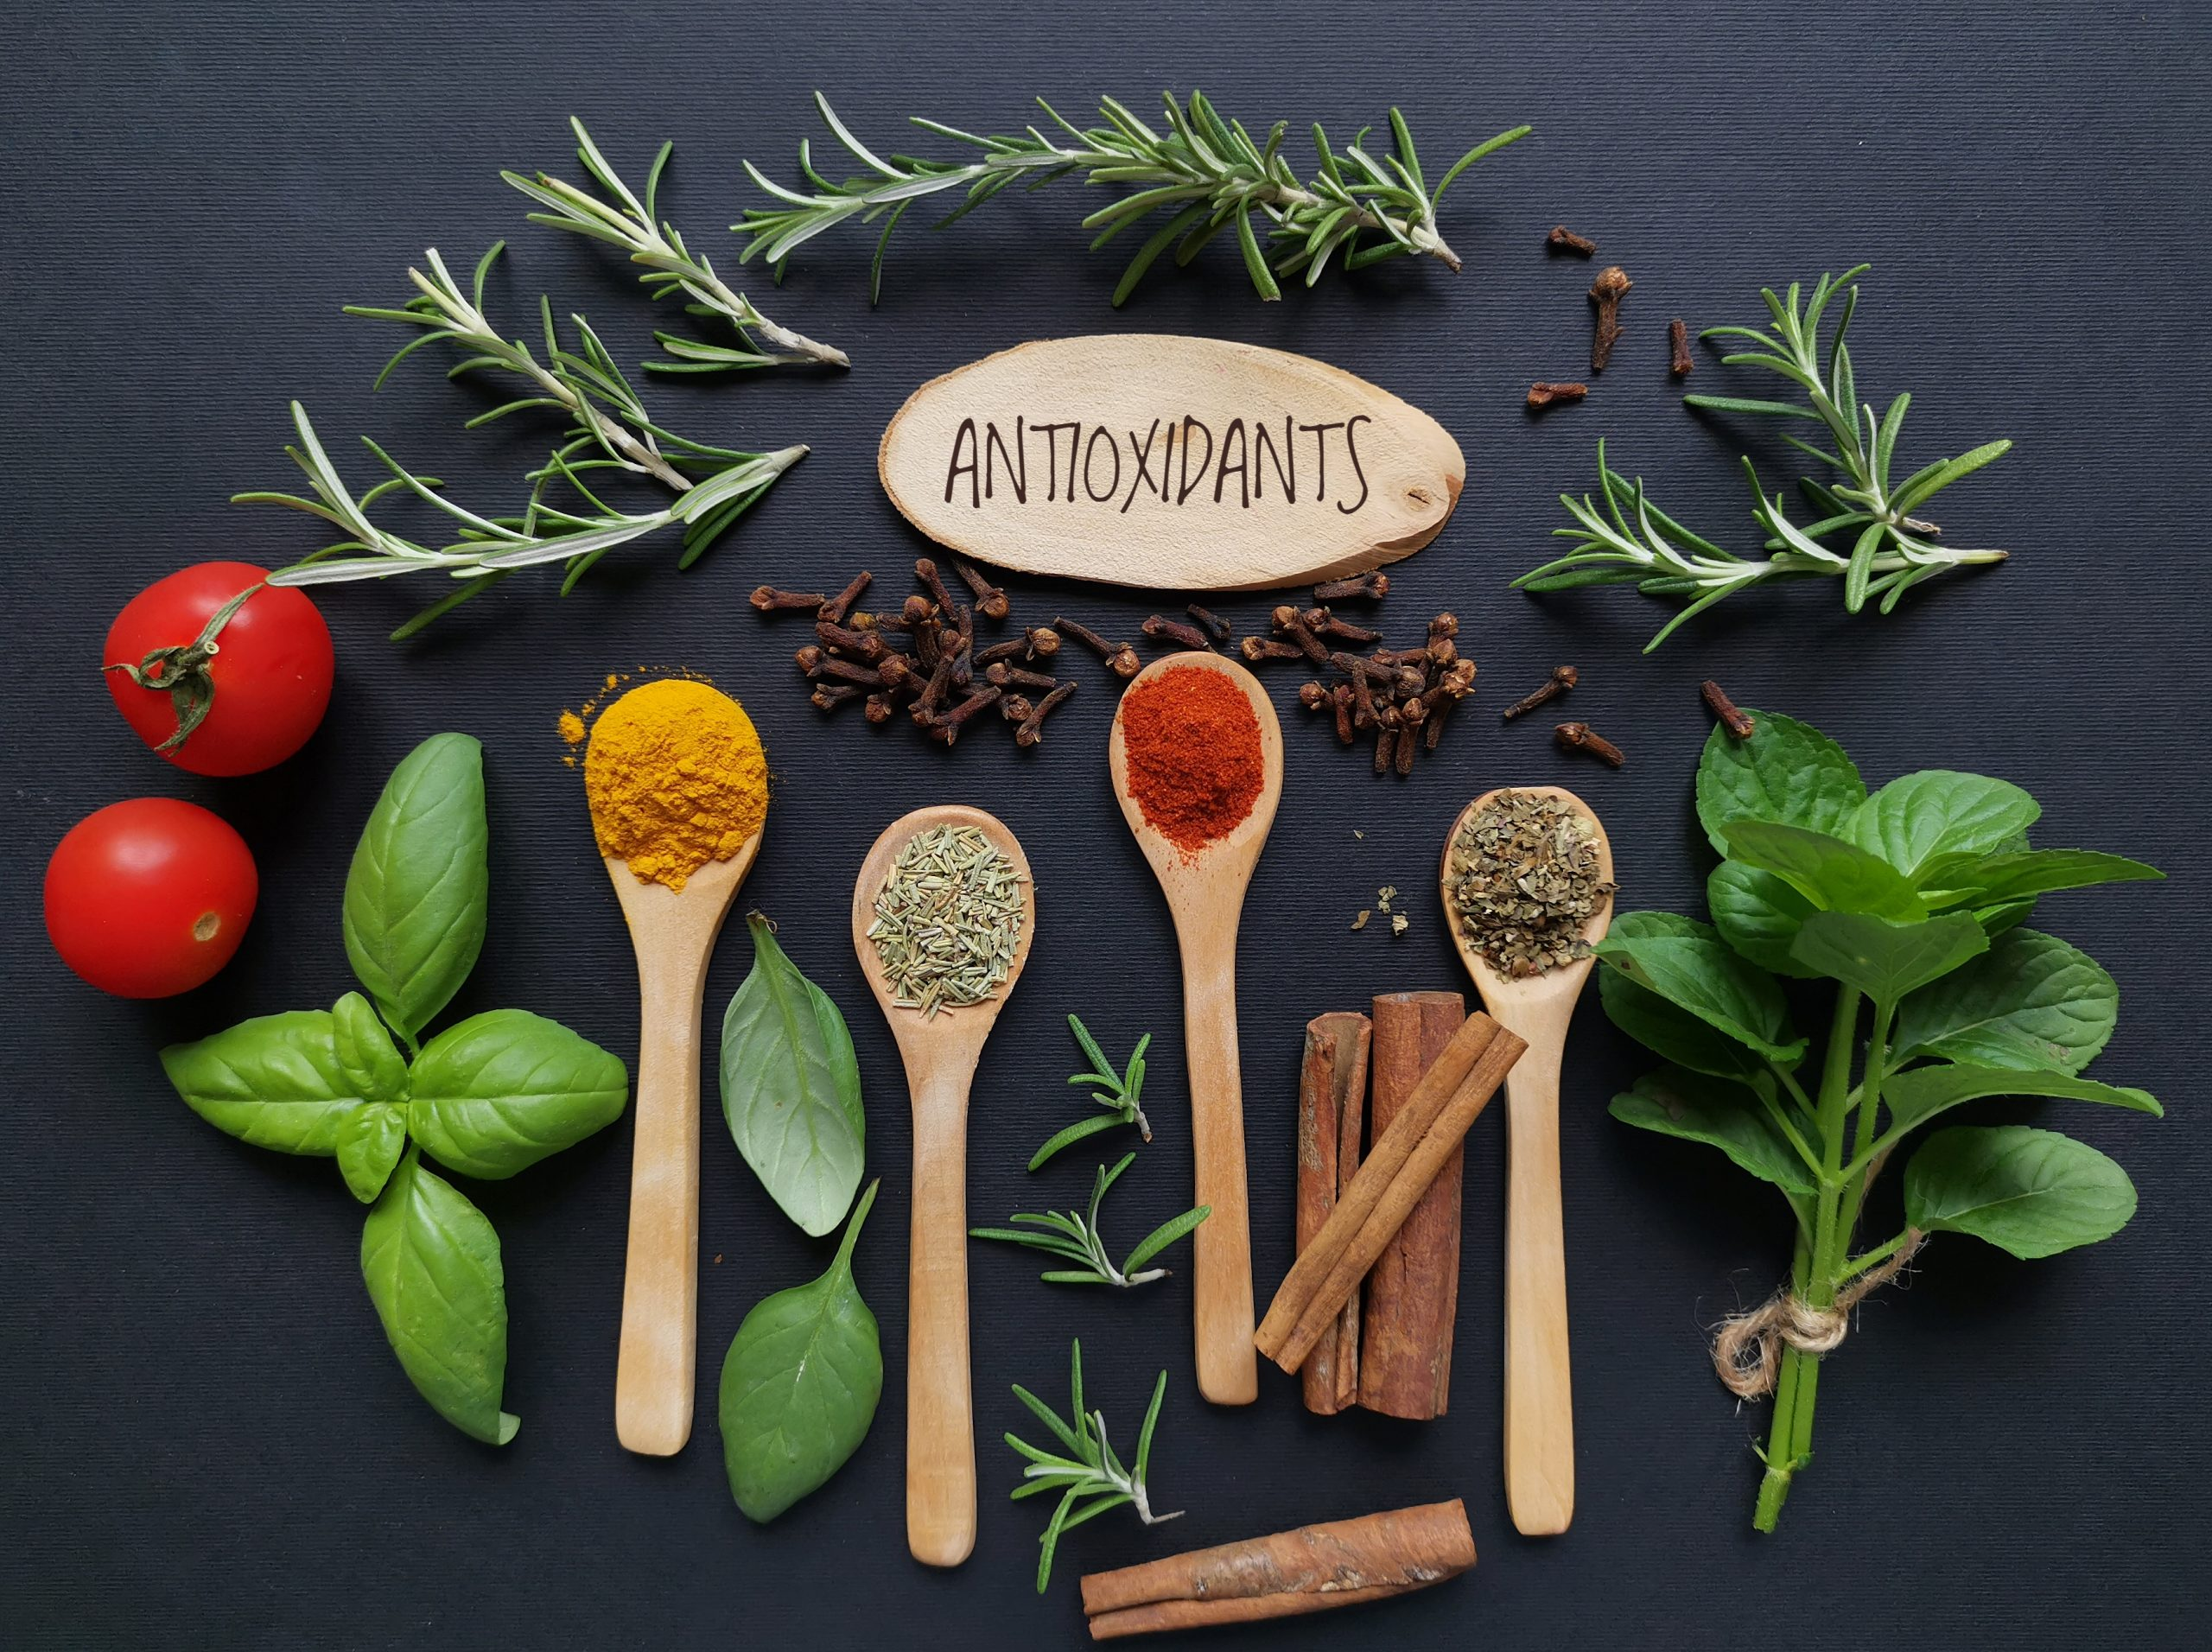 Health benefits of antioxidants